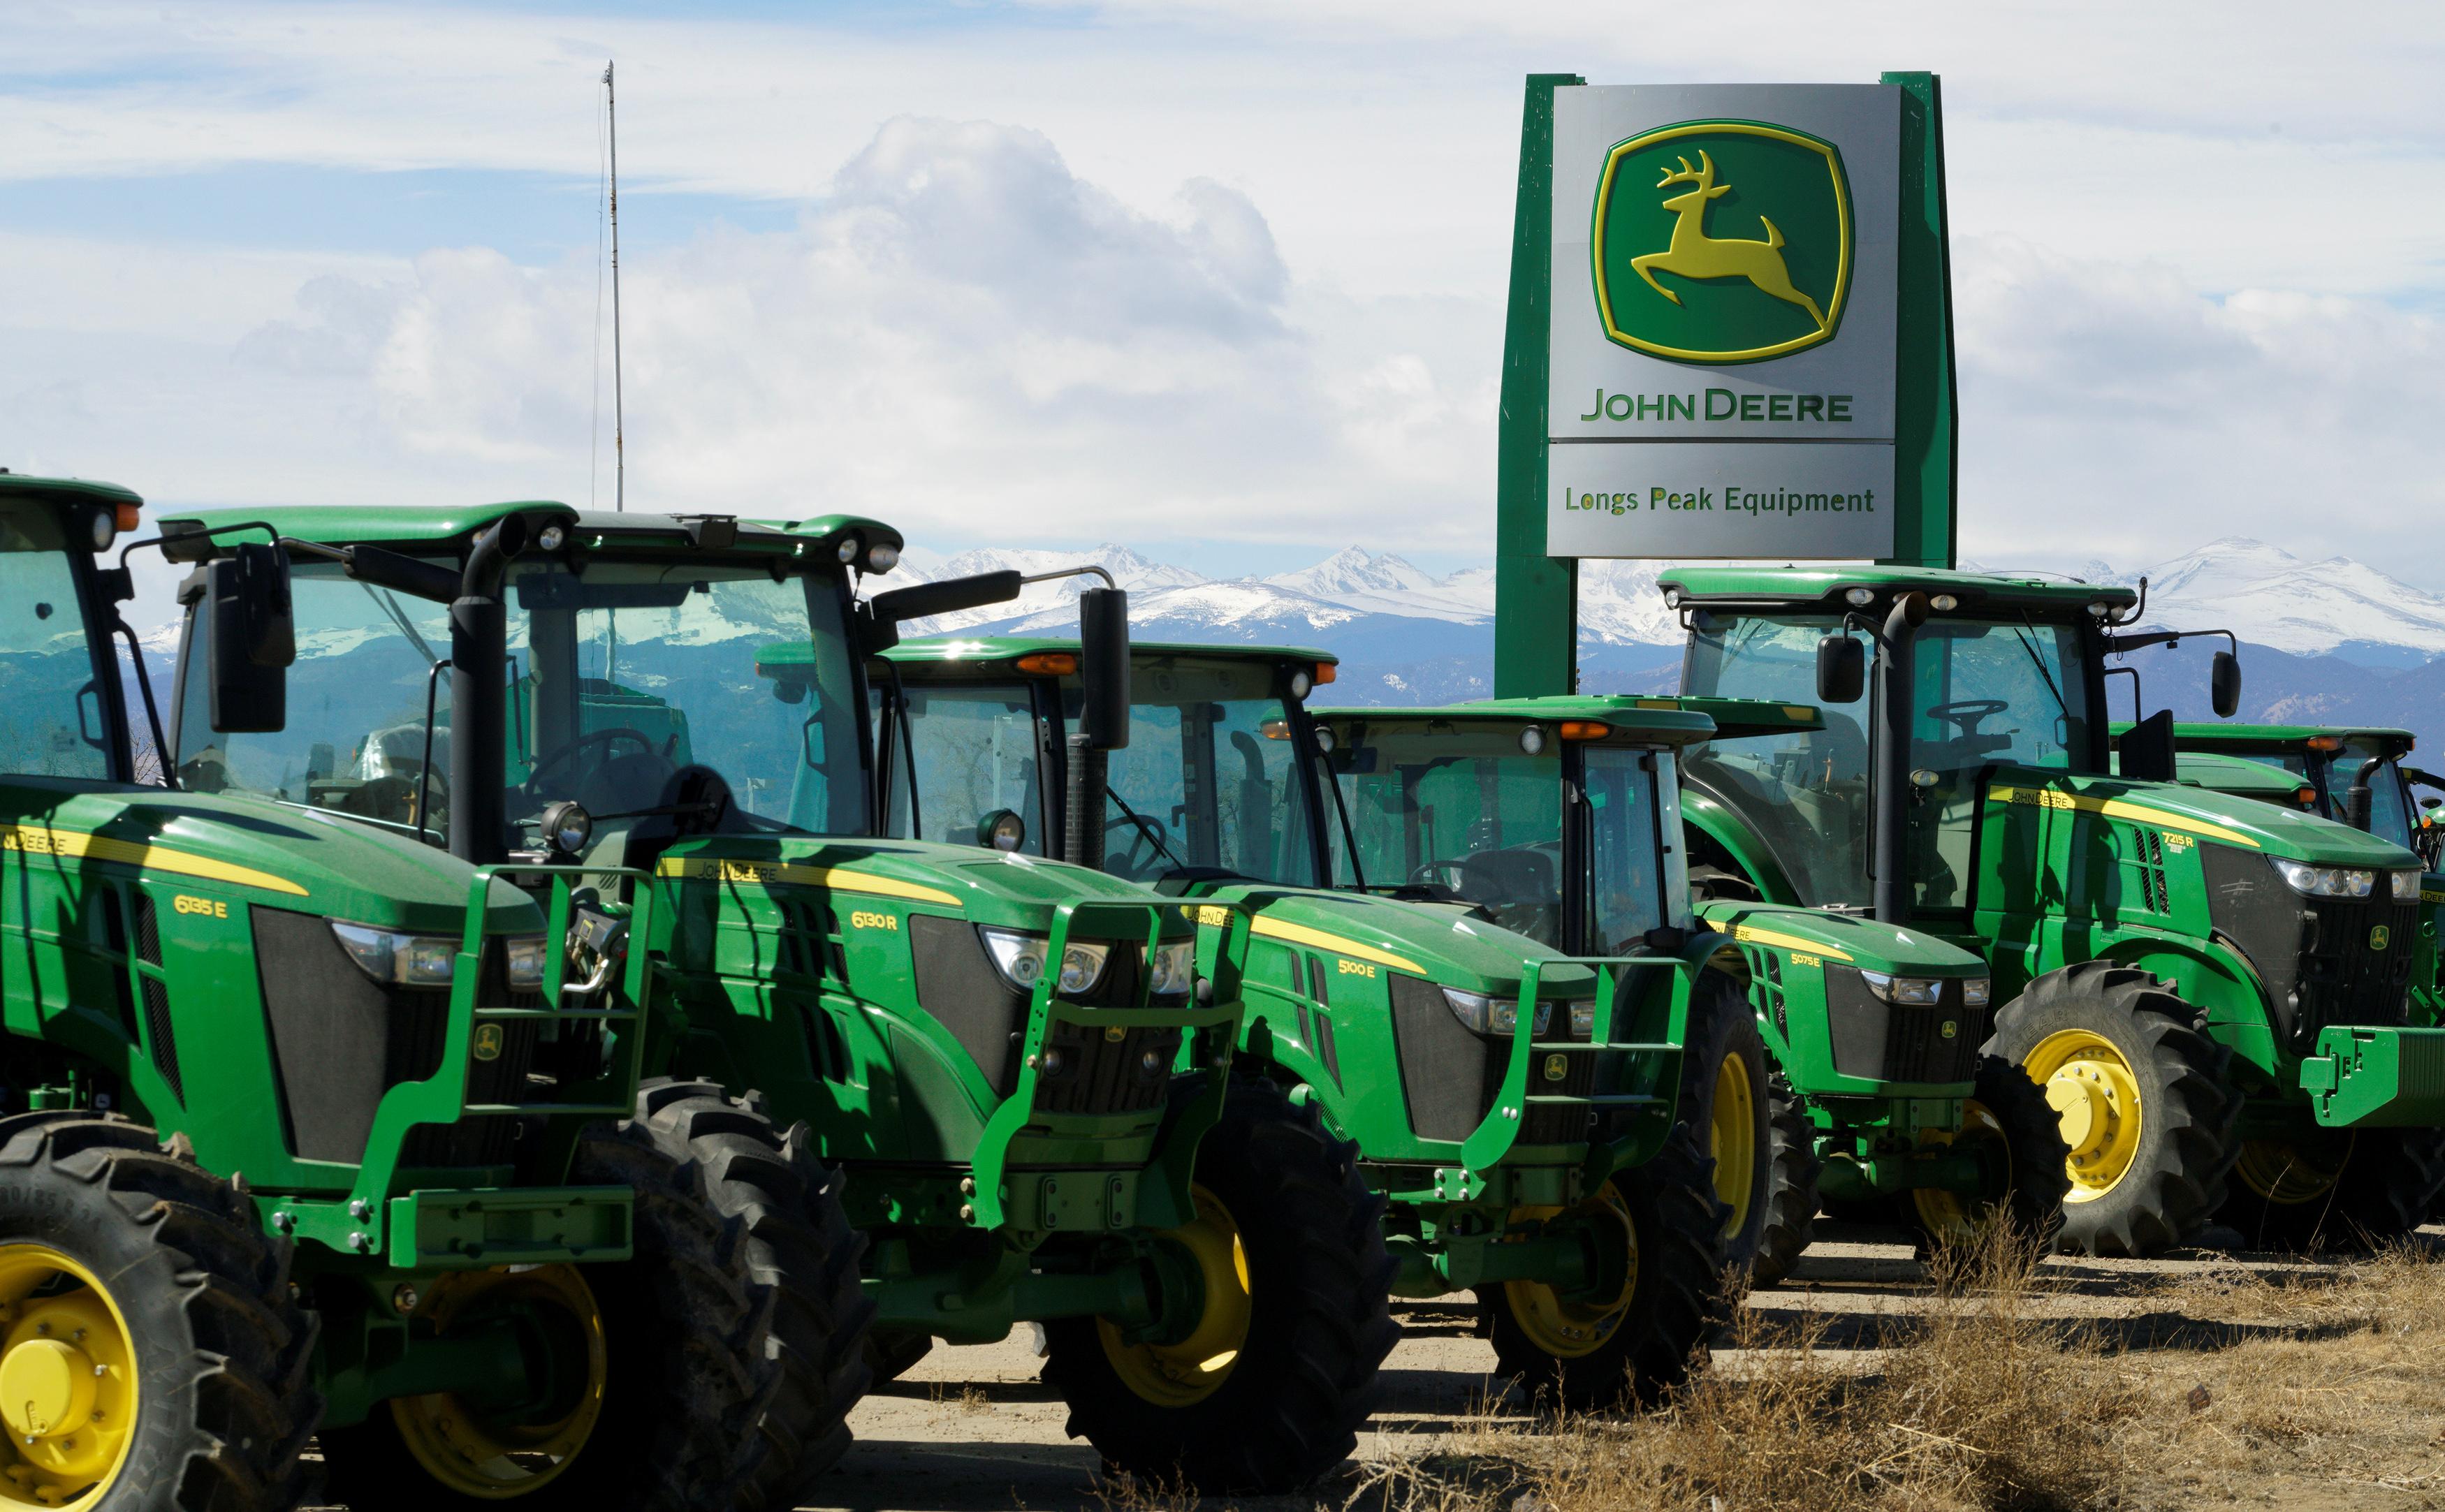 John Deere tractors are seen for sale at a dealer in Longmont, Colorado. REUTERS/Rick Wilking